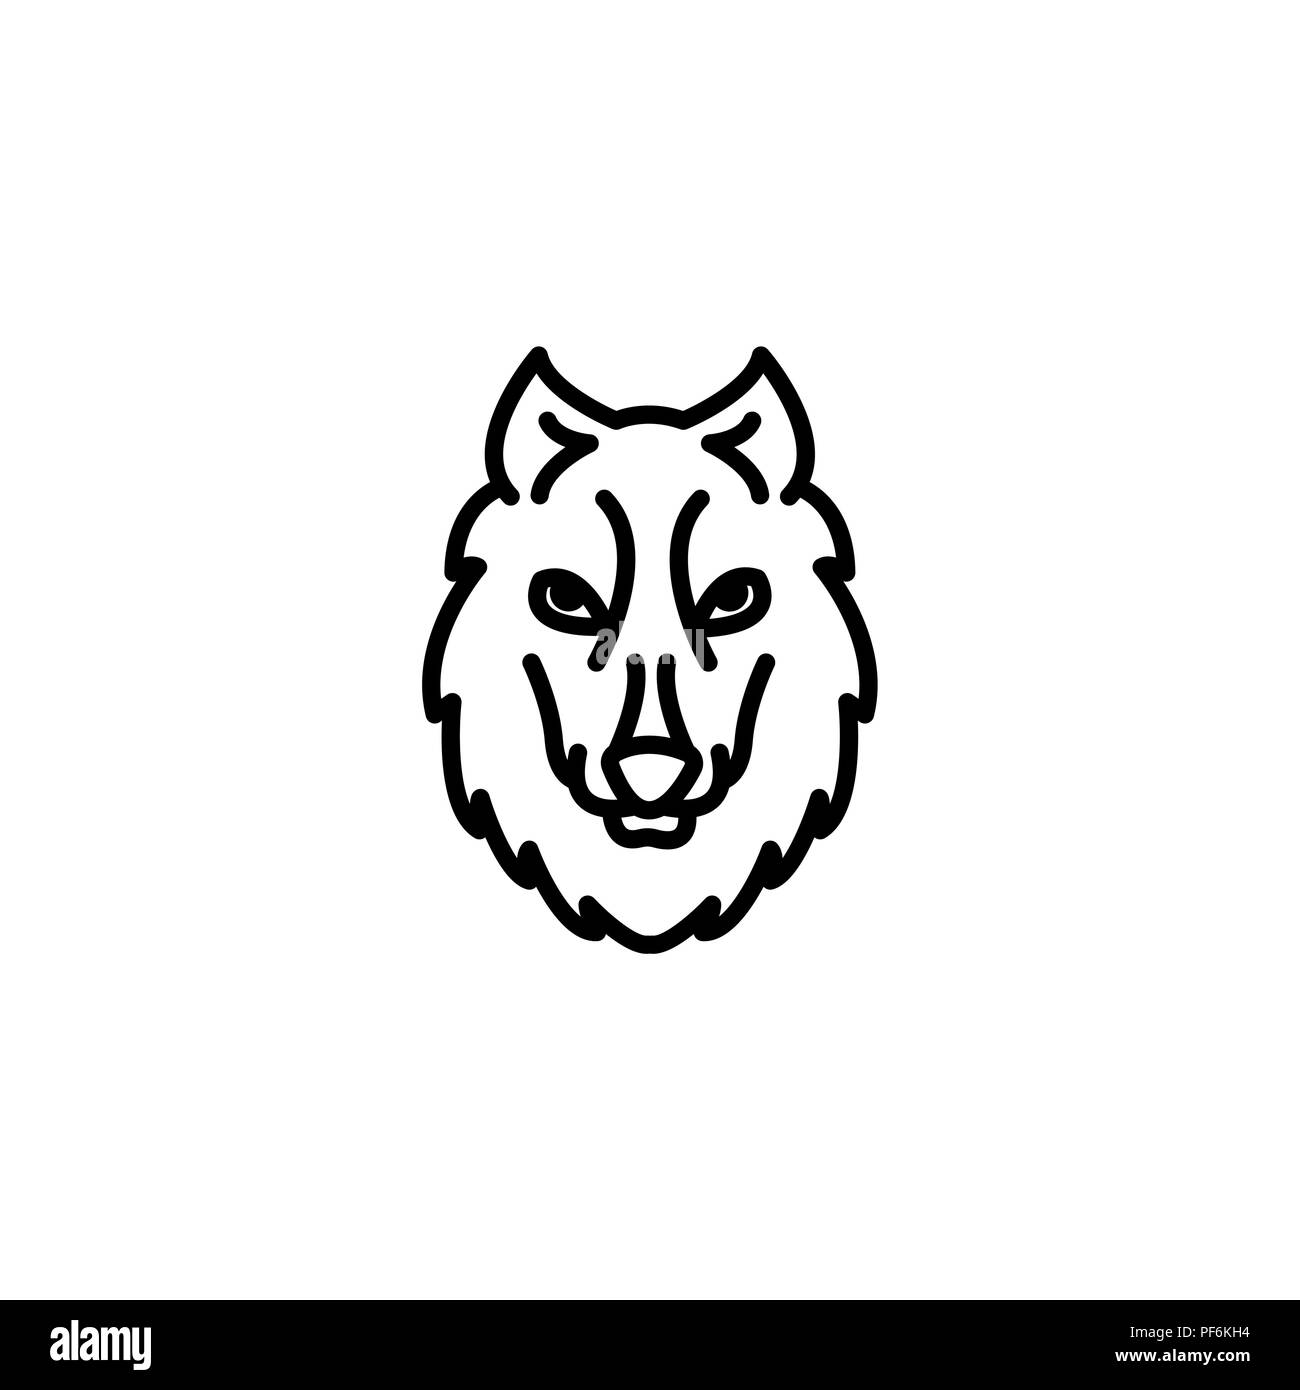 Web line icon. Wolf; wild animals black on white background - Stock Image